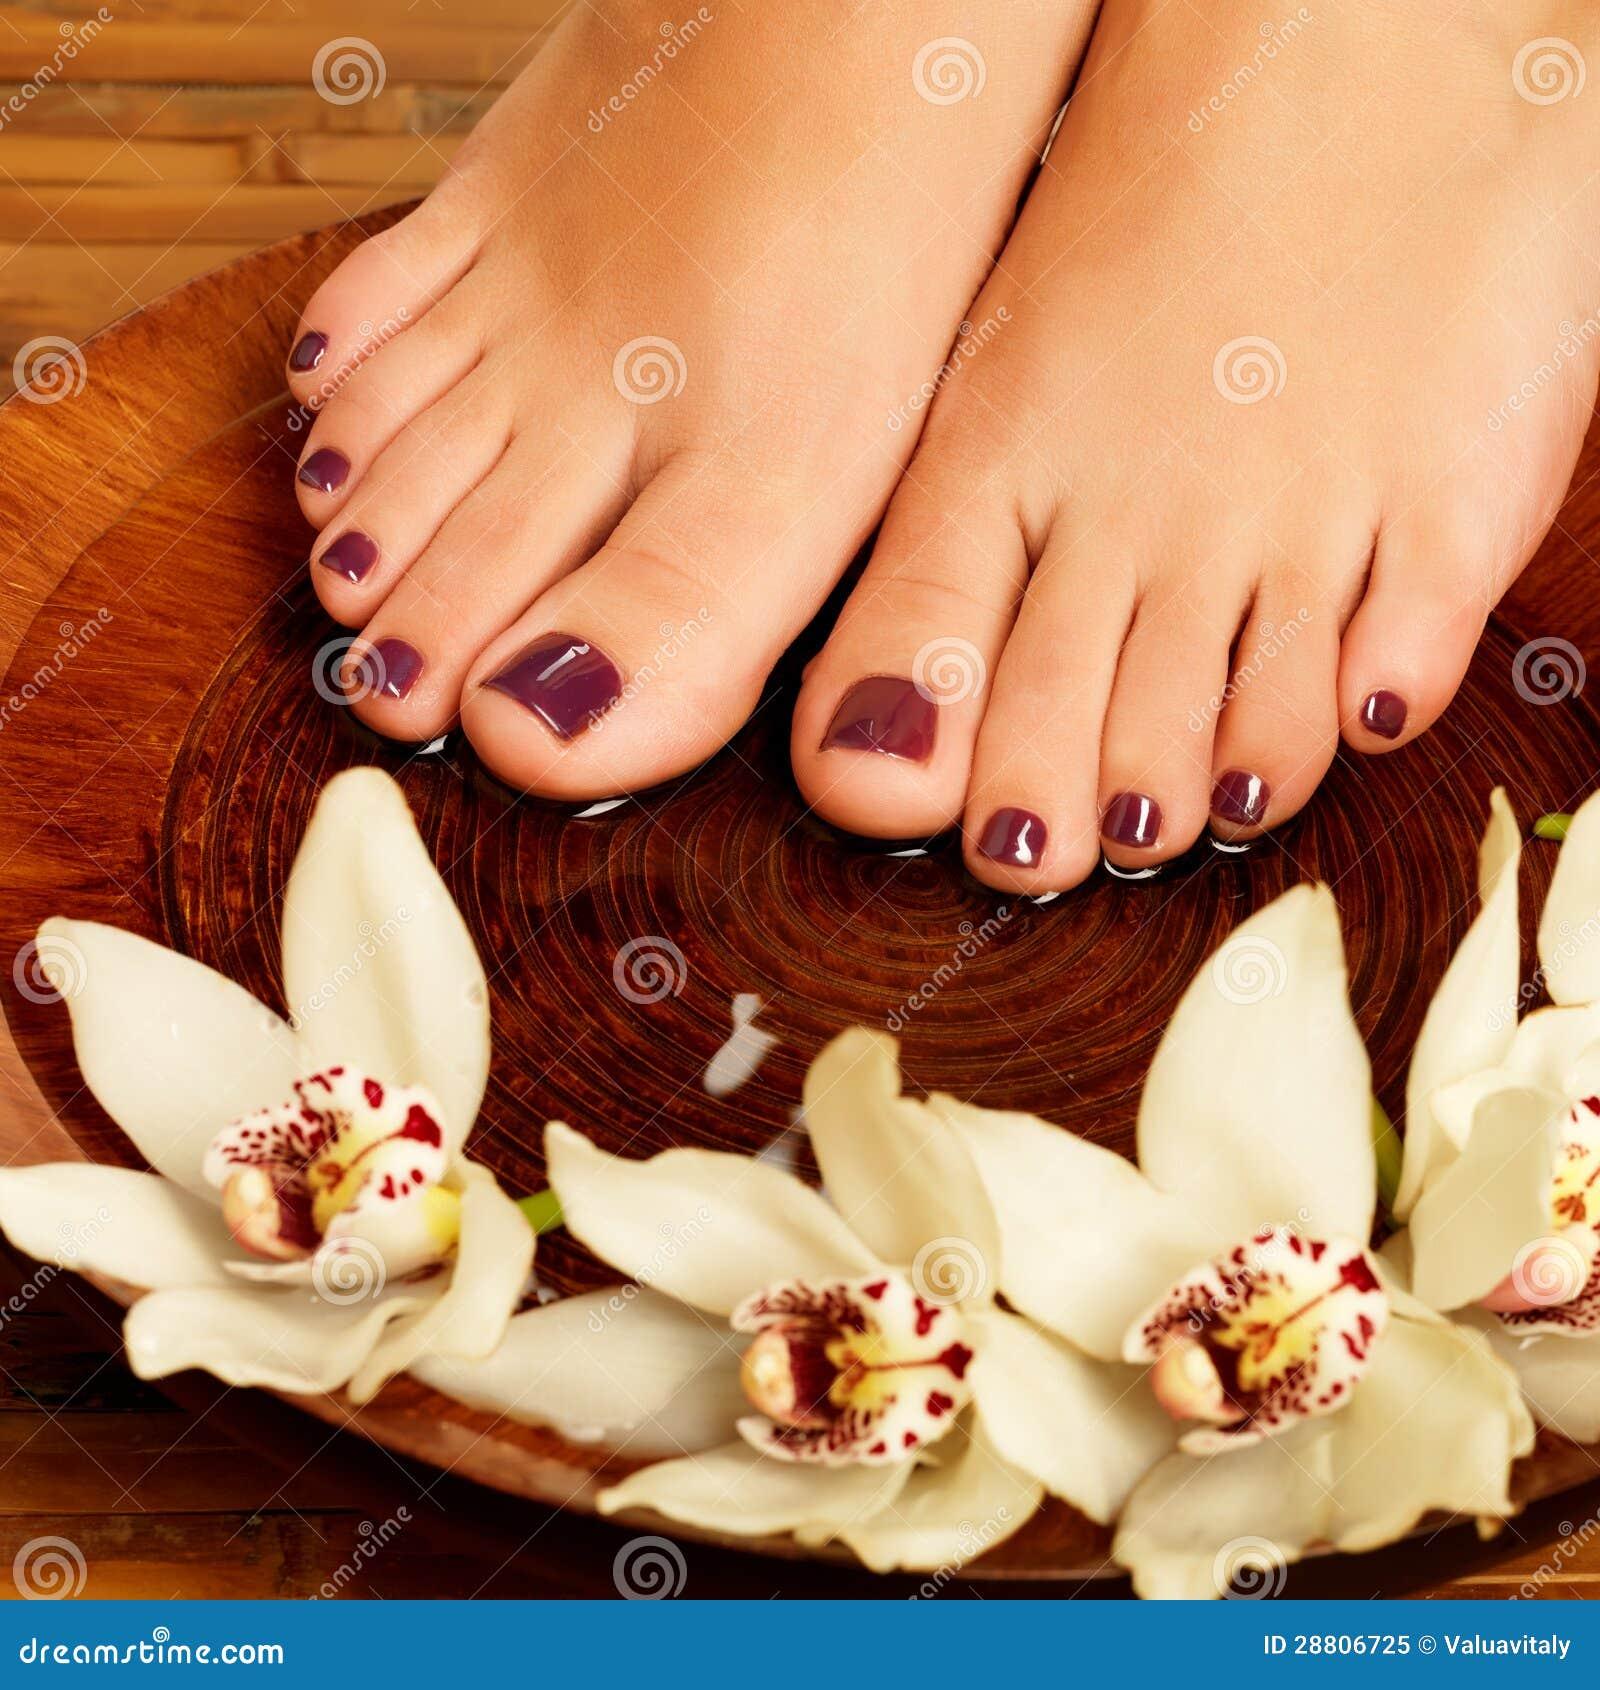 Female Feet At Spa Salon Pedicure Procedure Royalty